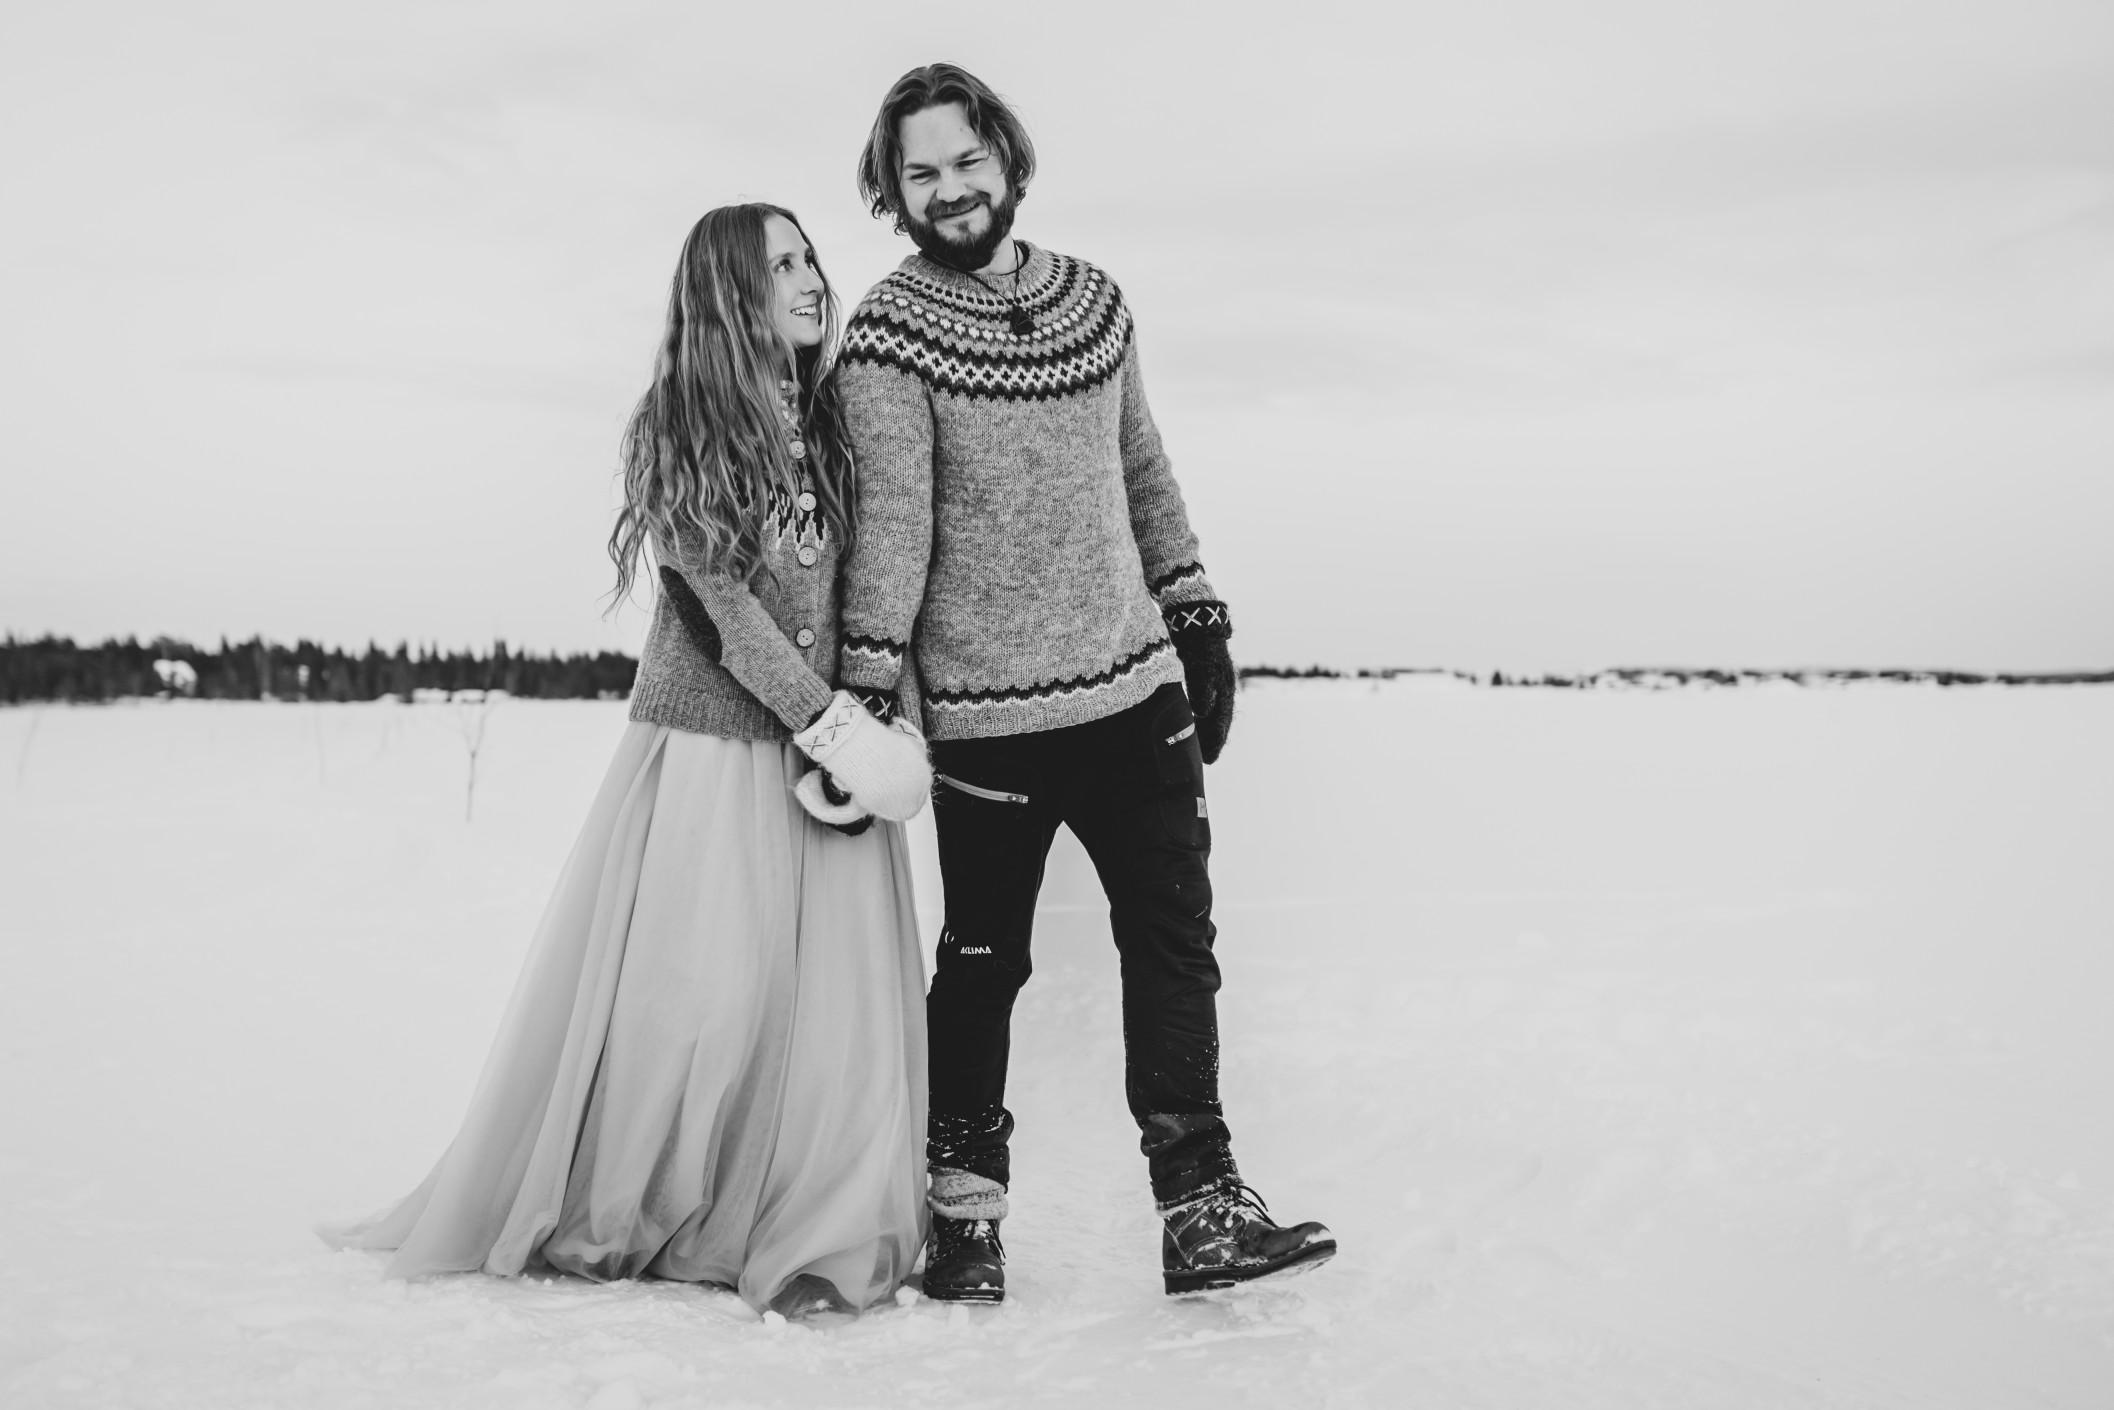 winter wedding at icehotel sweden - cinematic wedding photography - ice wedding - elopement in sweden - creative wedding photographer - unconventional wedding - alternative wedding - unique wedding - artistic wedding -winter wedding photos